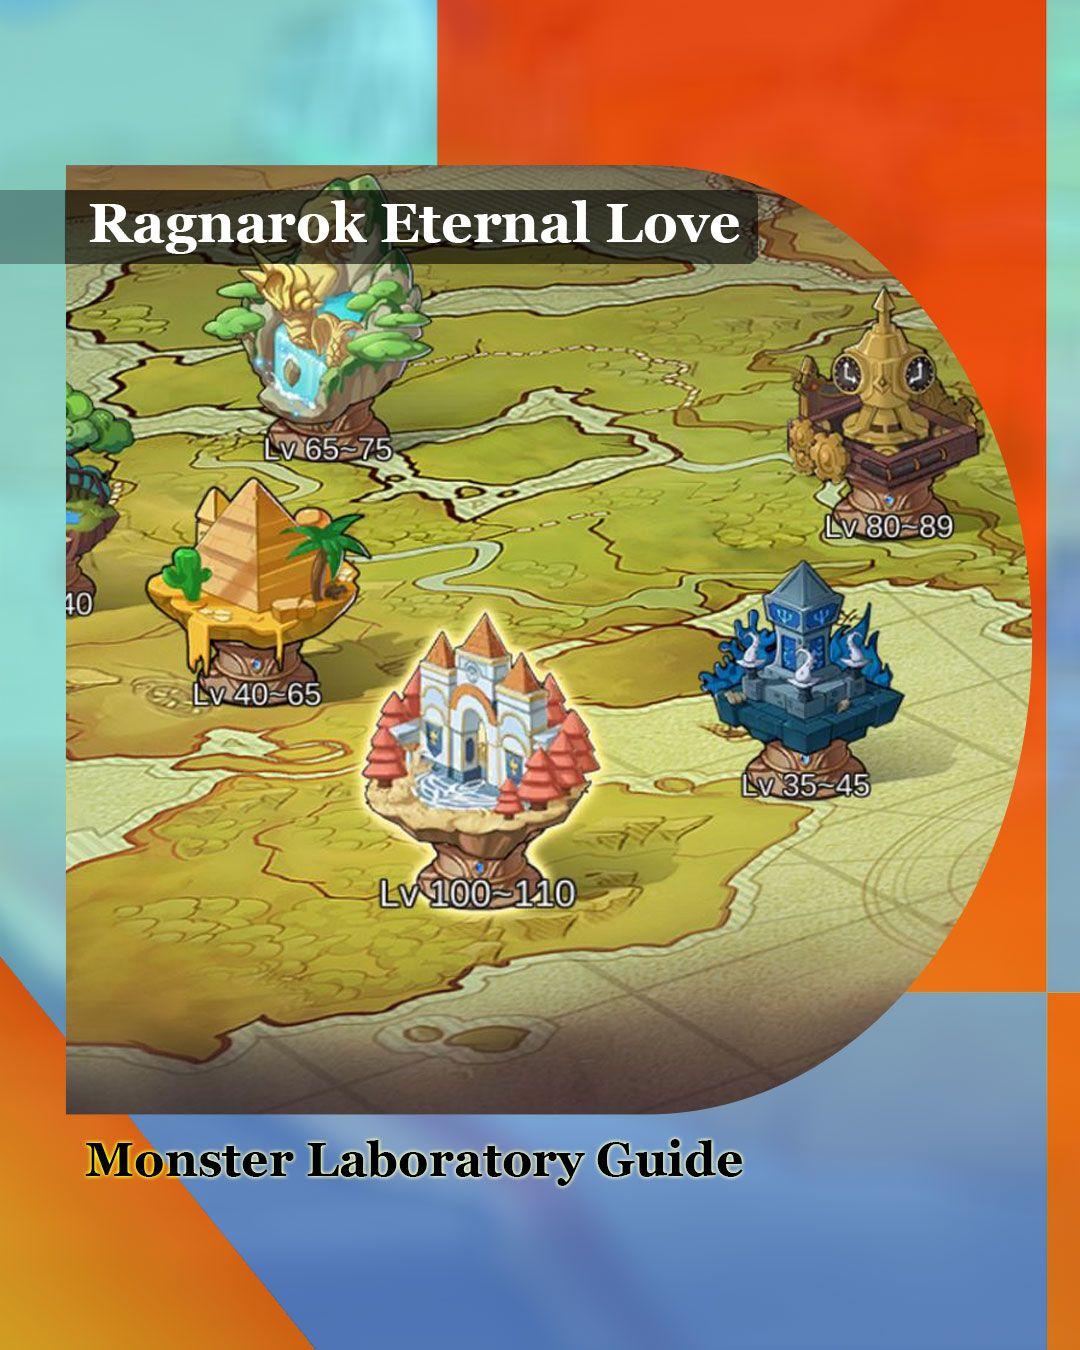 Full Monster Laboratory Guide In Ragnaroketernallove Gaming Gamerstopia Ragnarok Mobile The Warlocks Adventure Map